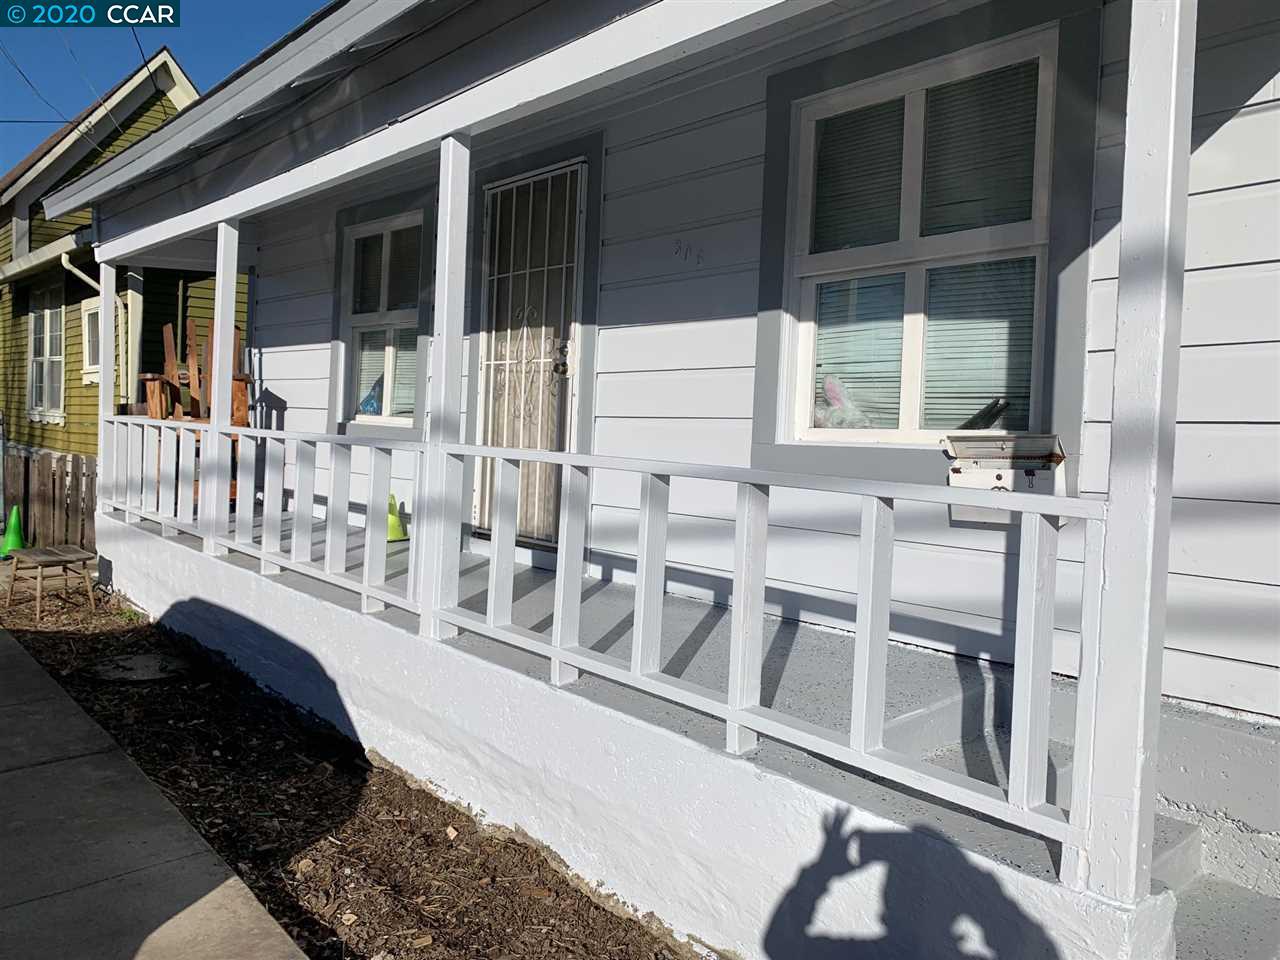 306 Cordelia St Suisun City, CA 94585